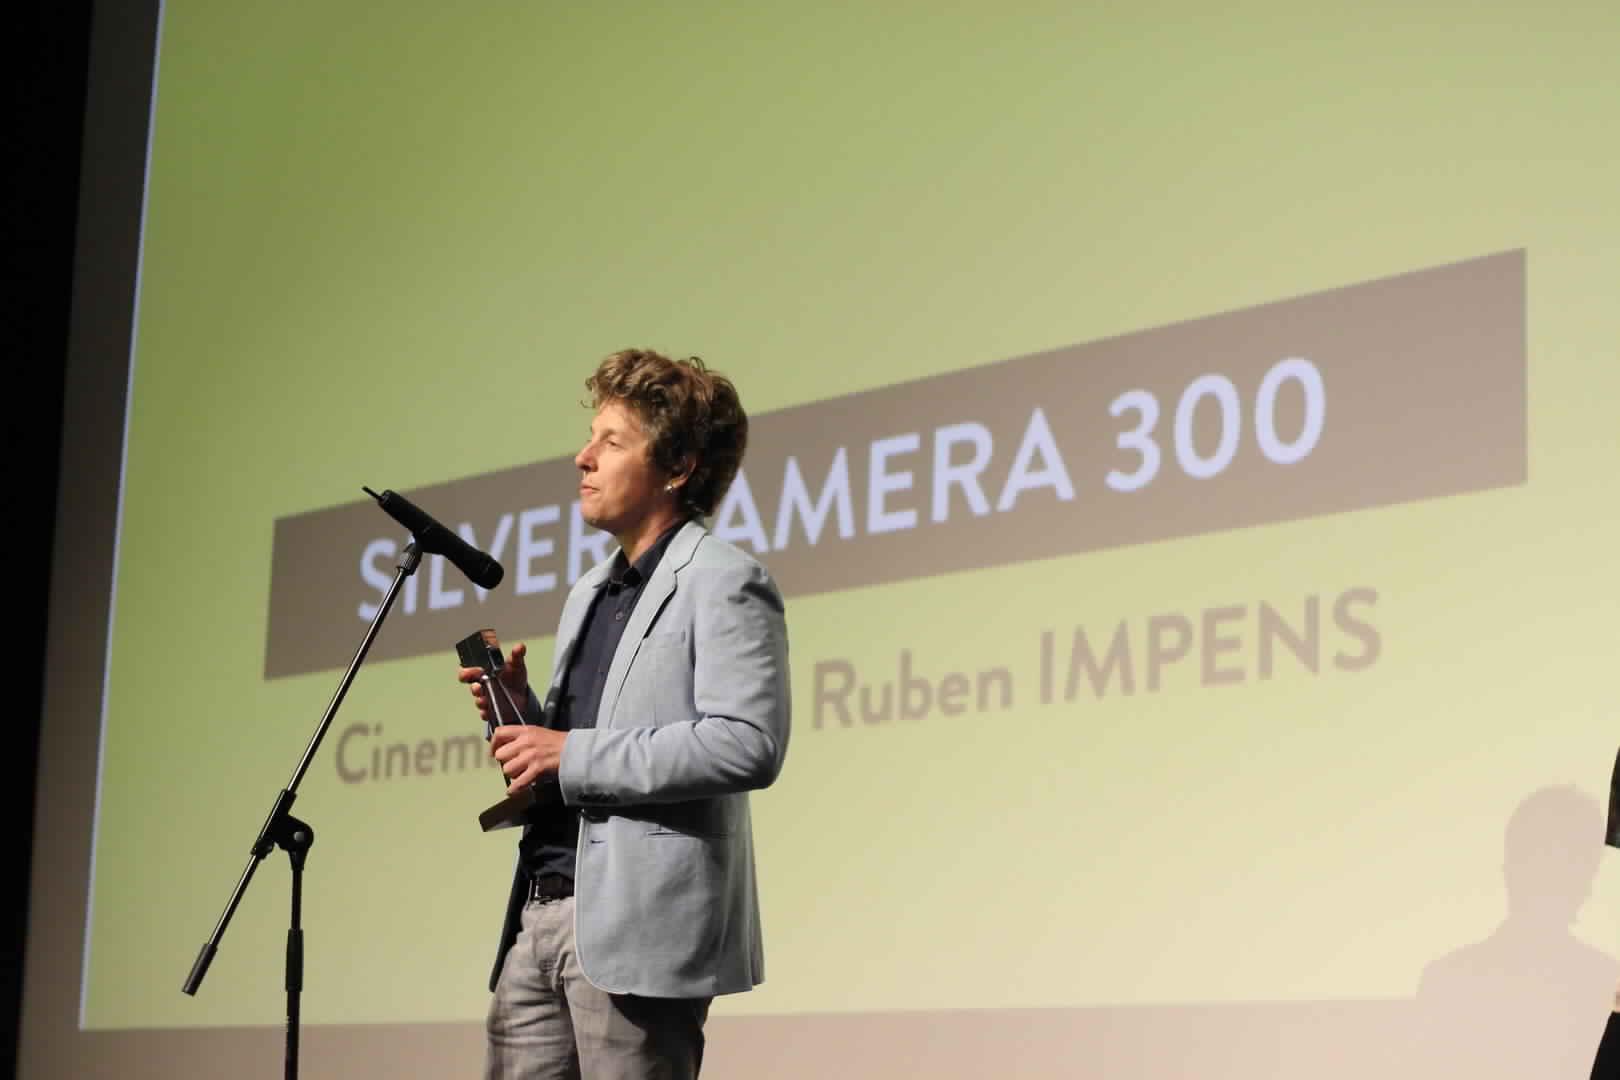 Ruben Impens, Silver Camera 300 at Manaki